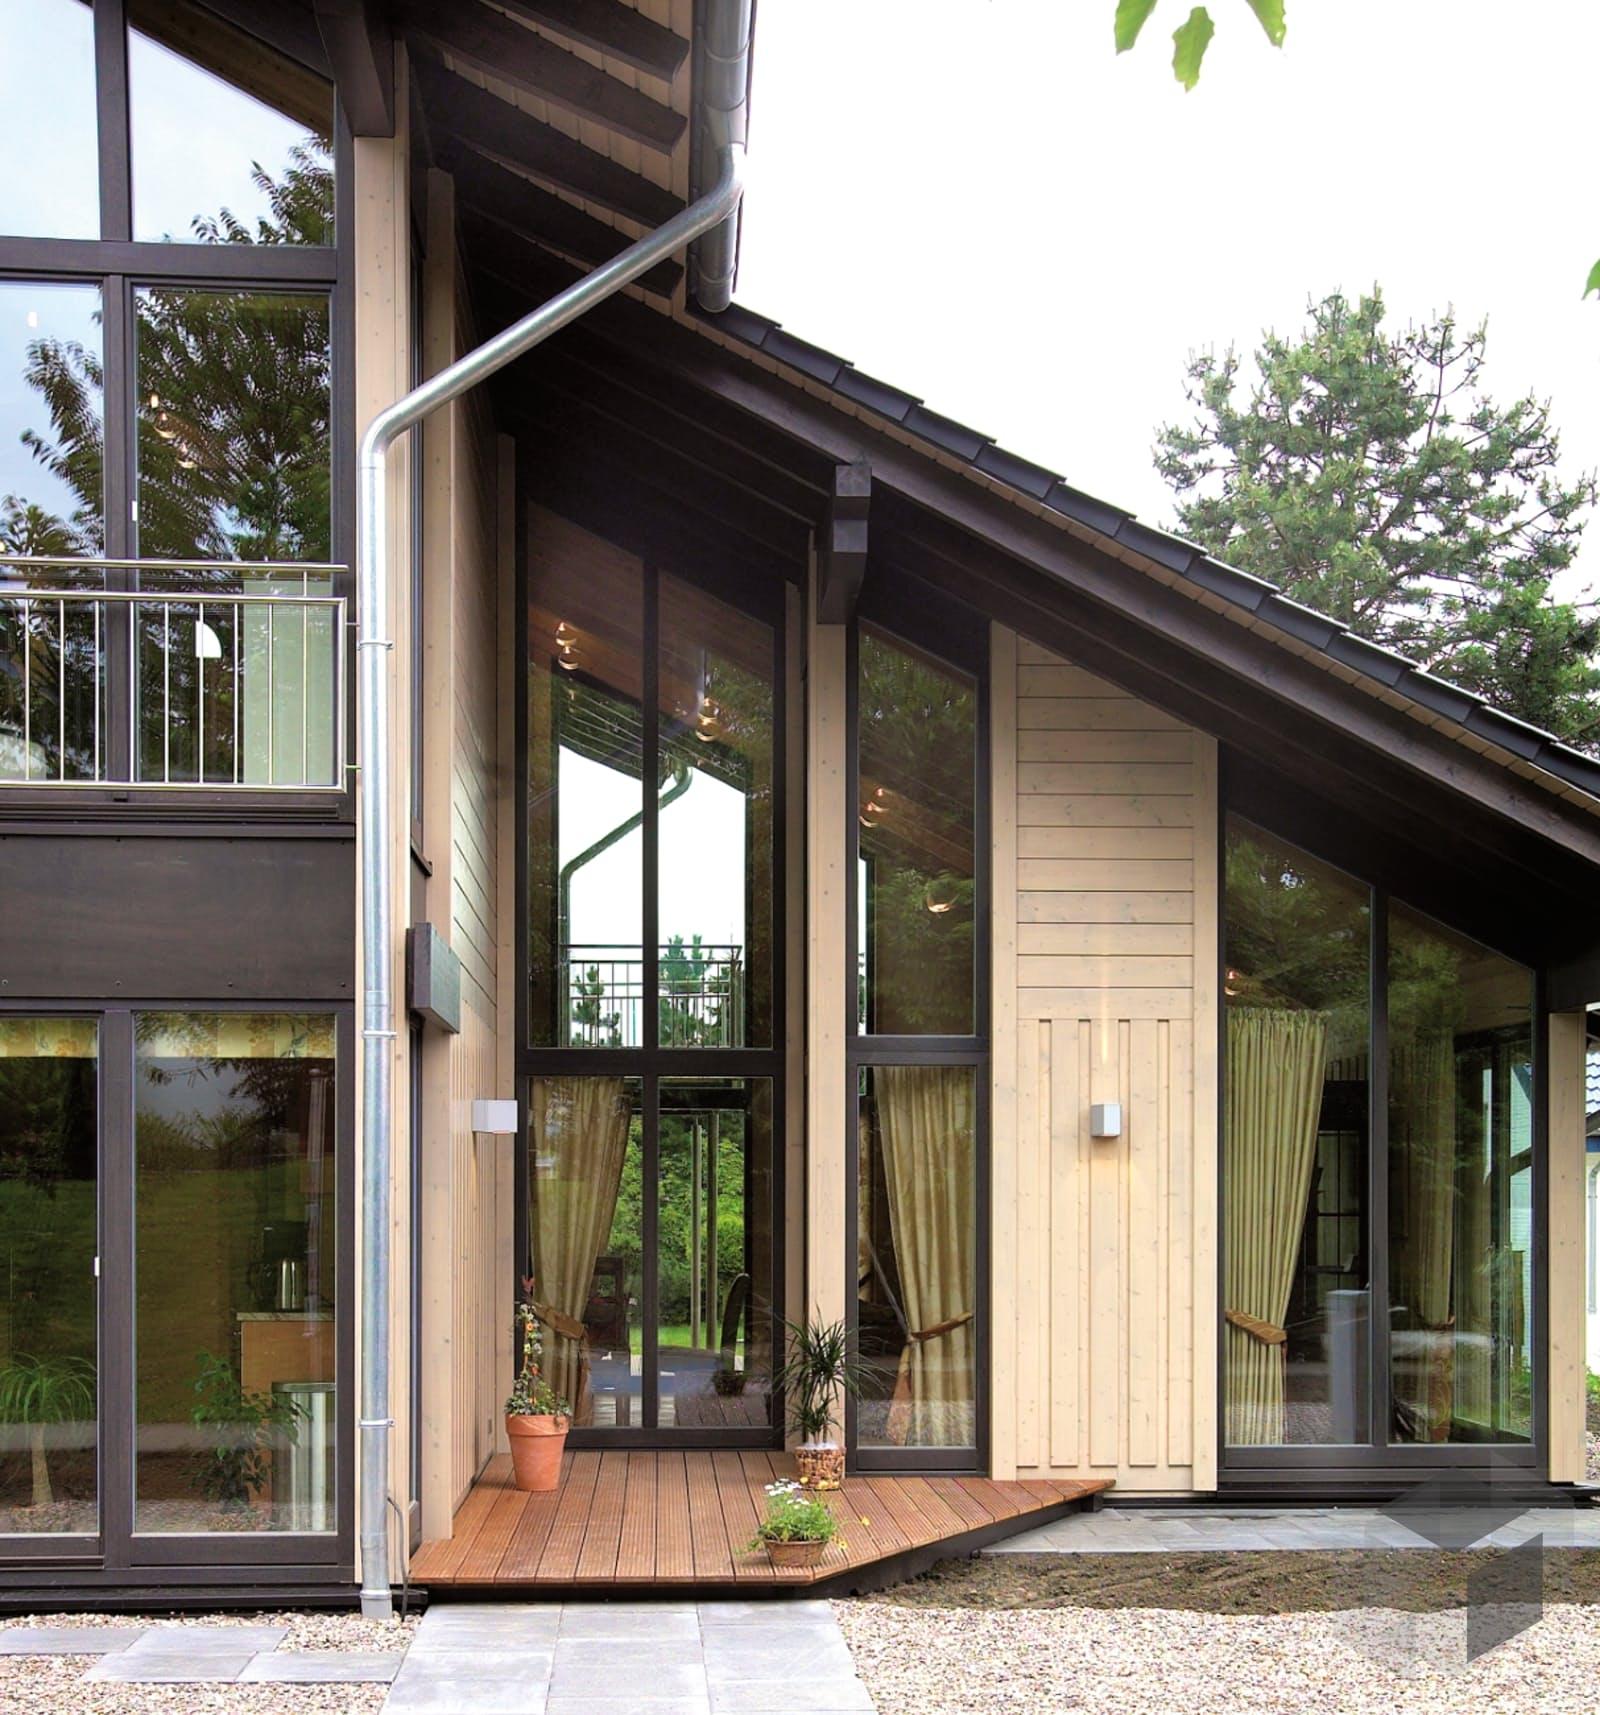 bambus inactive von stommel haus komplette. Black Bedroom Furniture Sets. Home Design Ideas